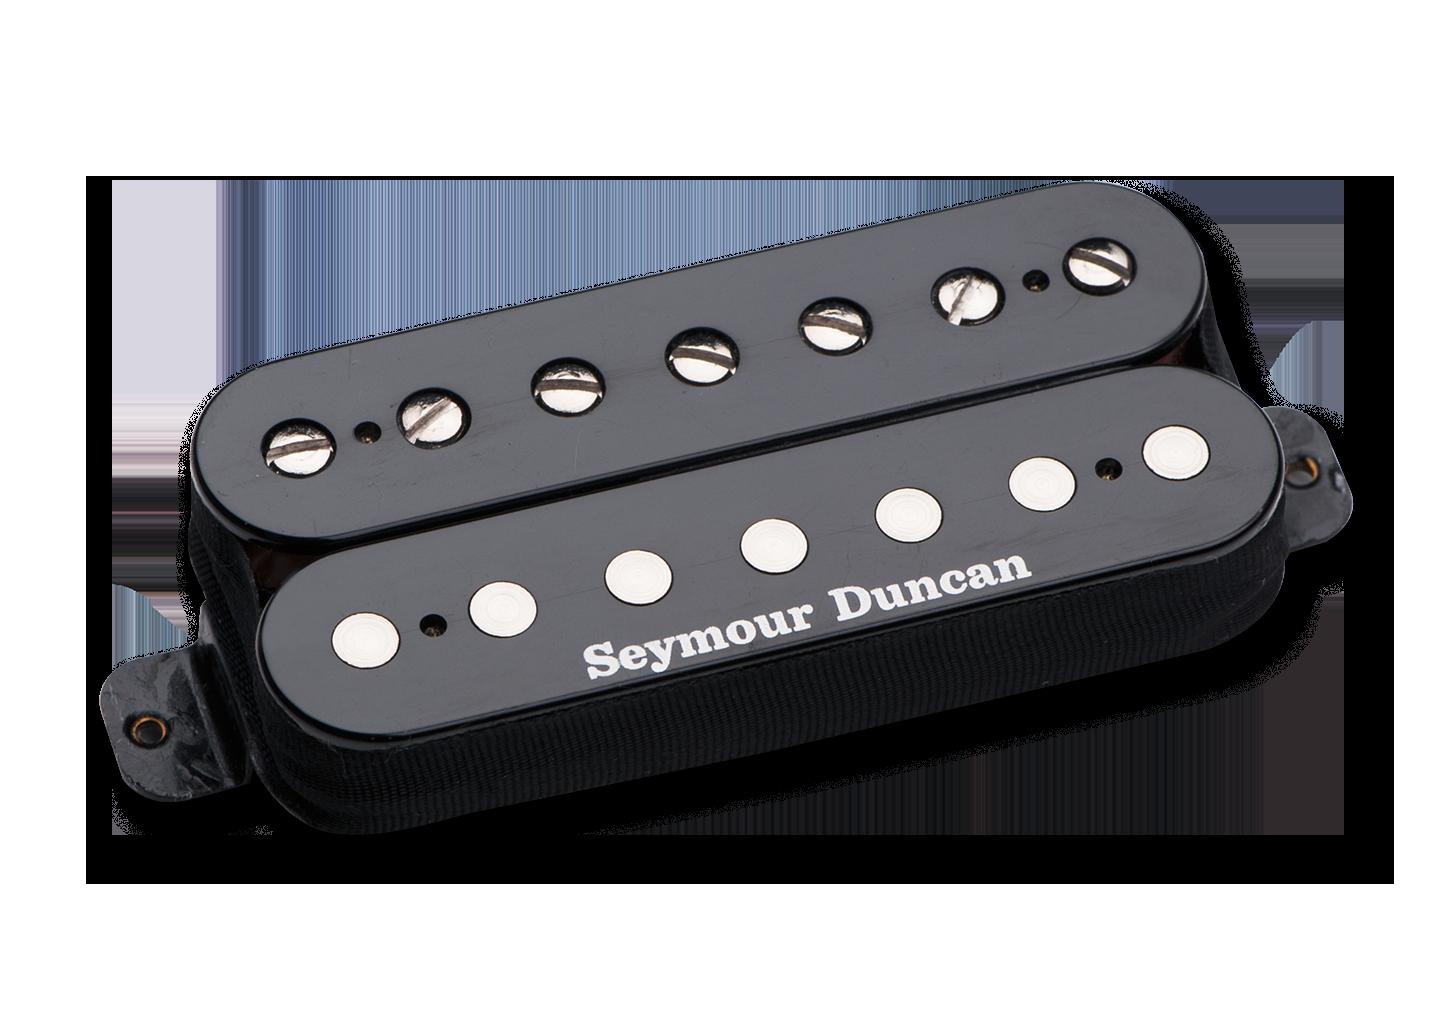 Seymour Duncan '59 Humbucker - SH-1N 7-String Neck Black